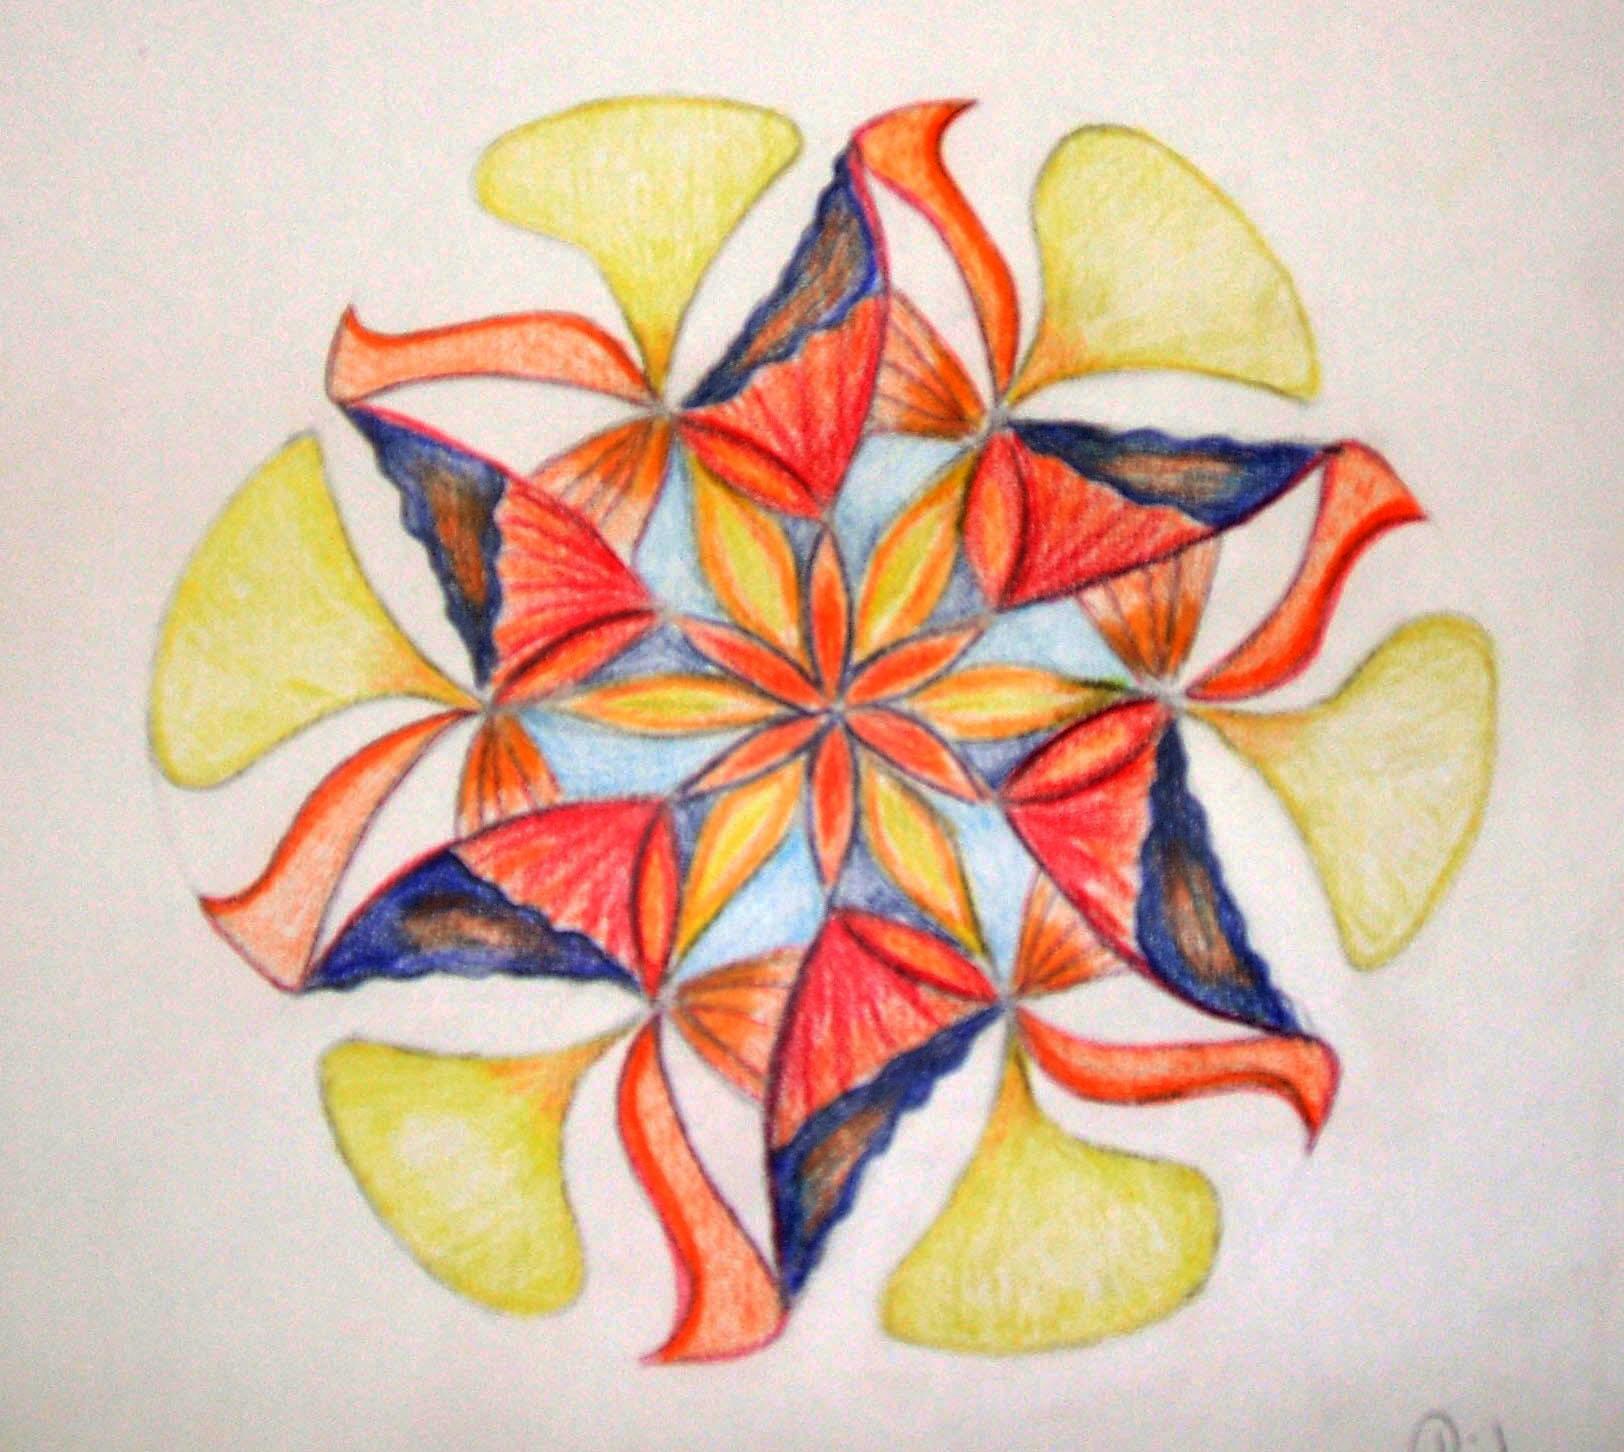 opleiding kunstzinnige therapie